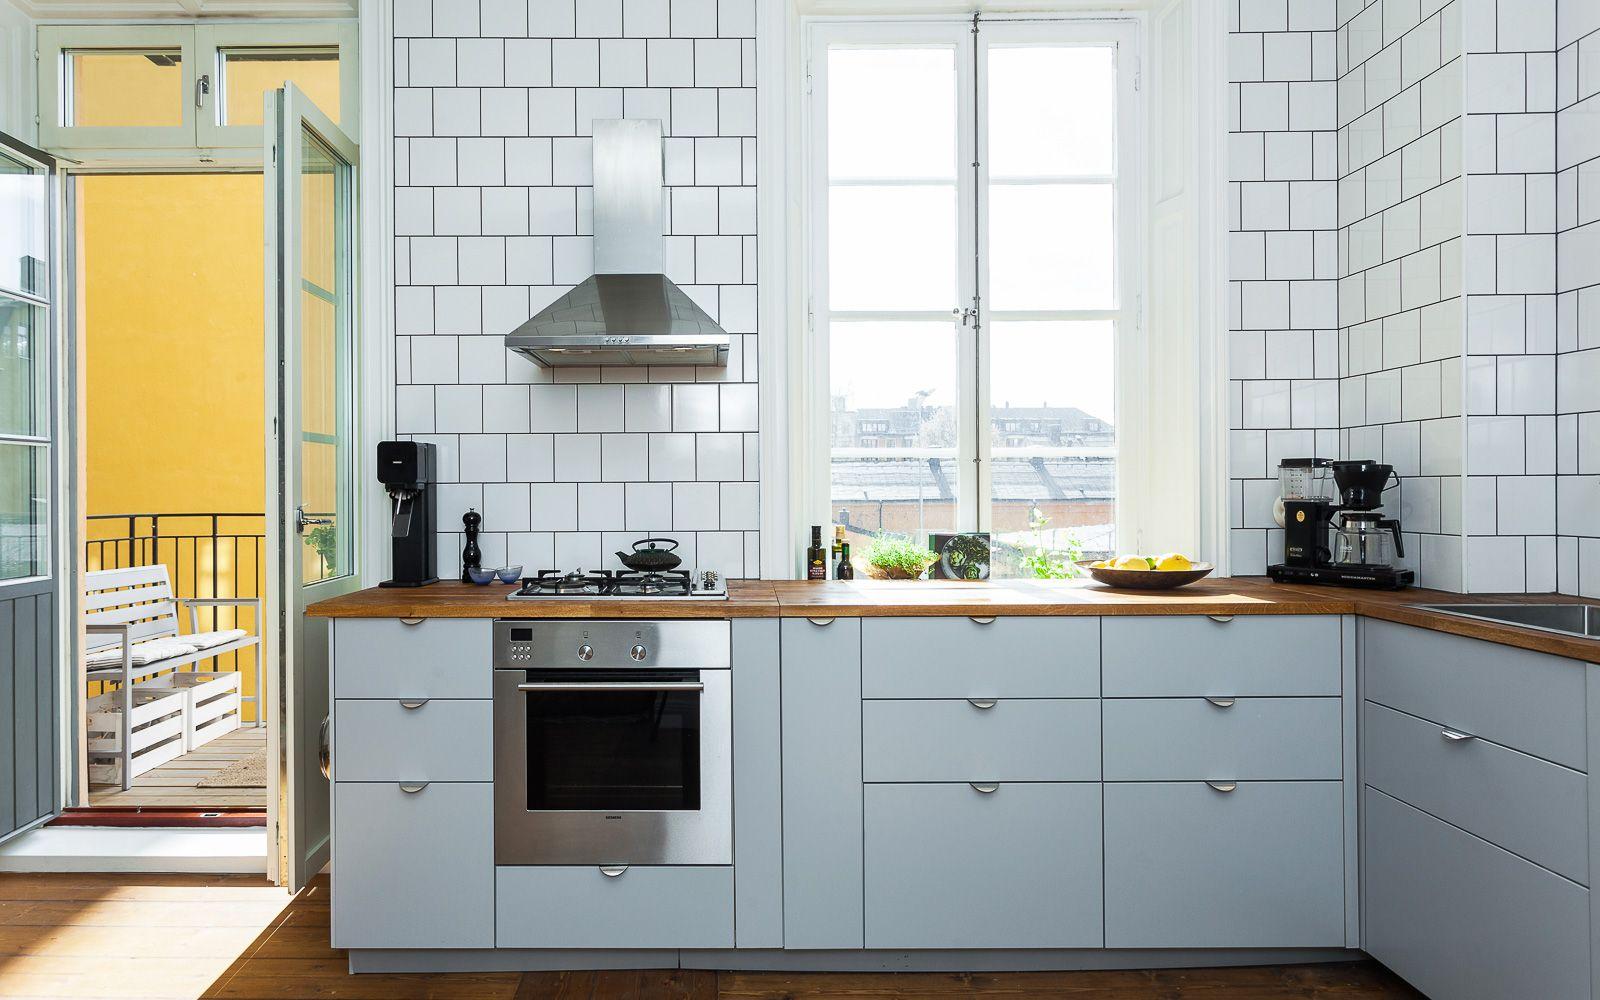 Pin By Emilie Ponthieu On Kitchen Kitchen Furnishings Kitchen Design Kitchen Inspirations